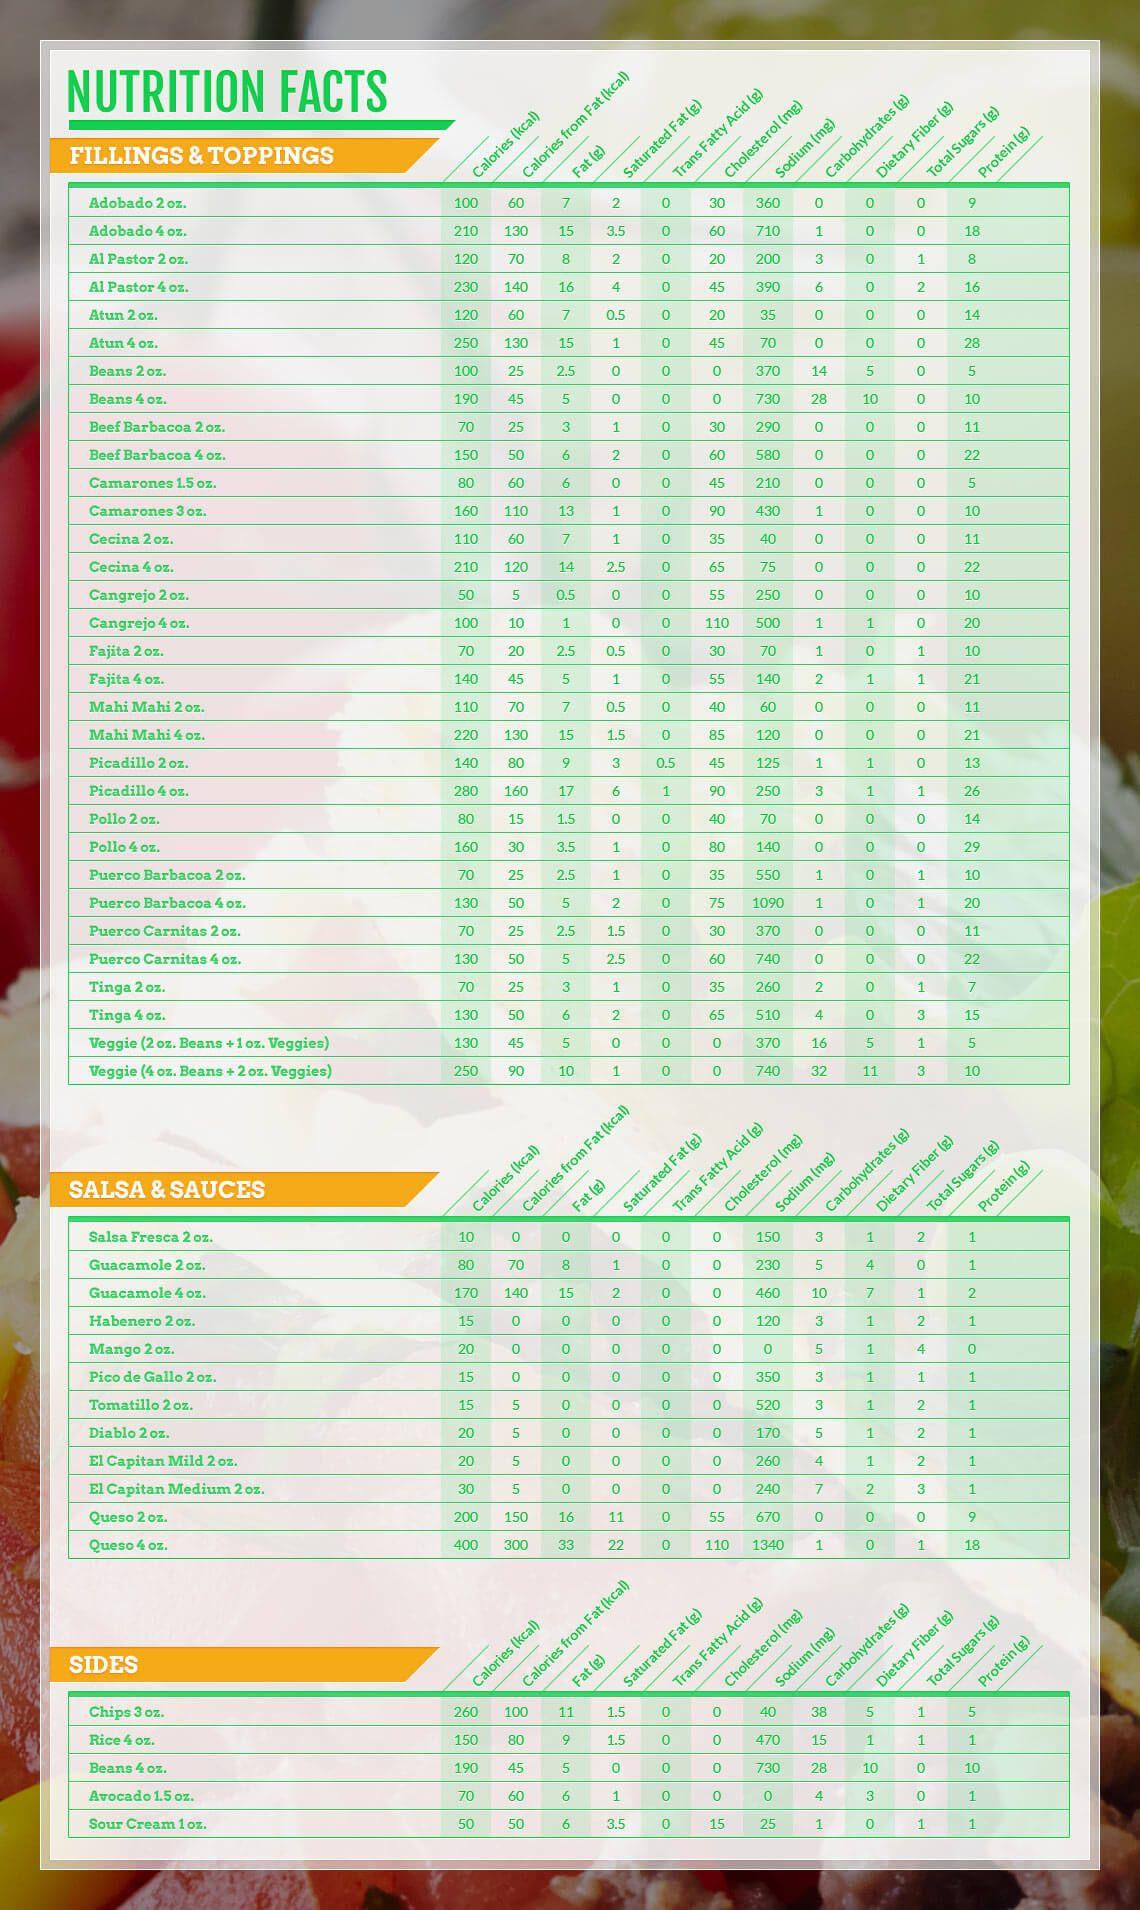 yolandas_infographic2-1.jpg